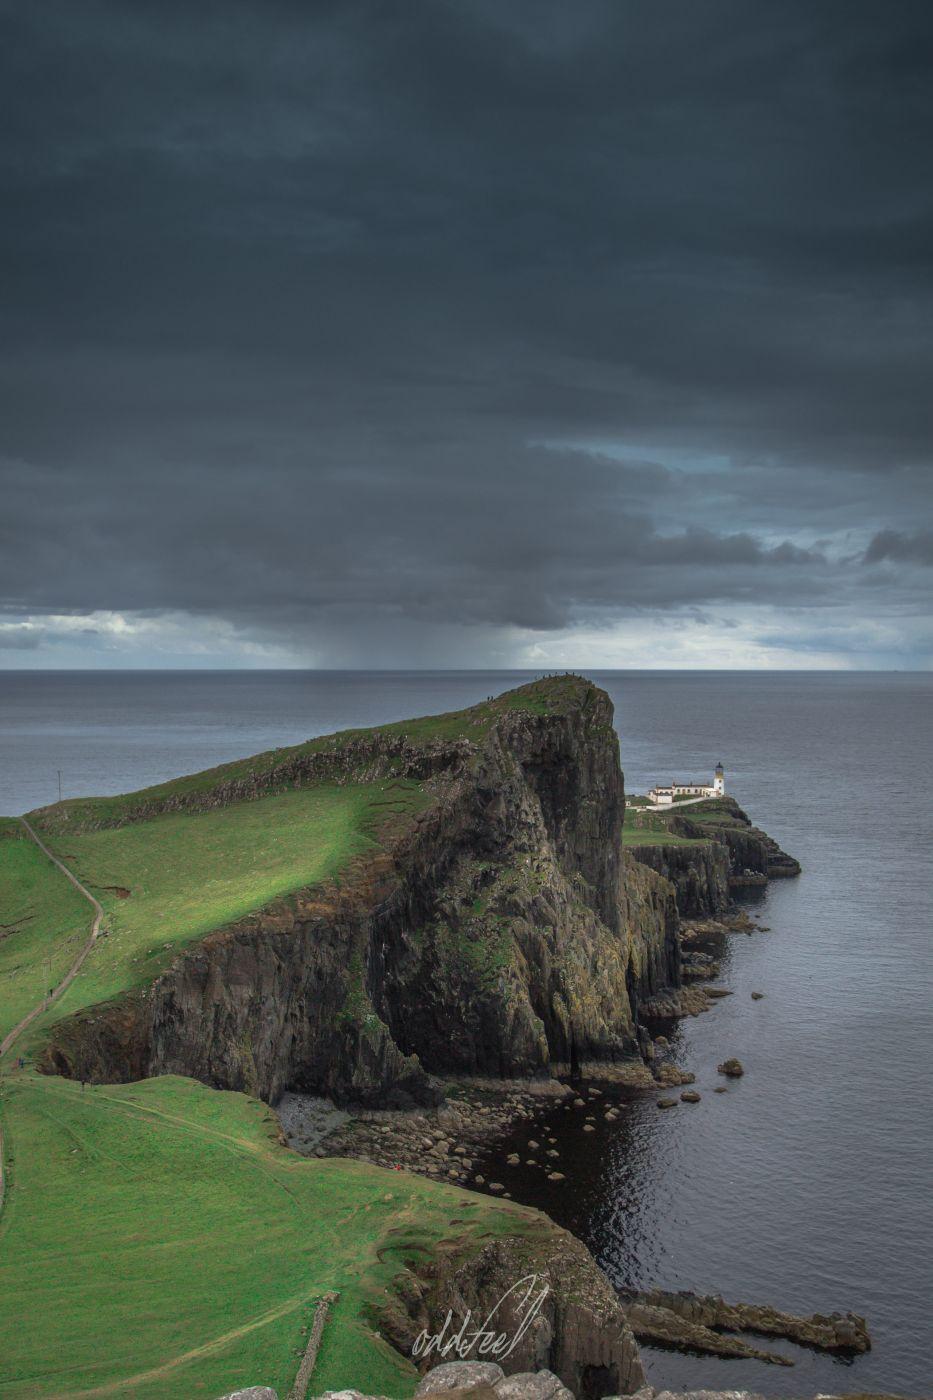 Neist Point Lighthouse, United Kingdom